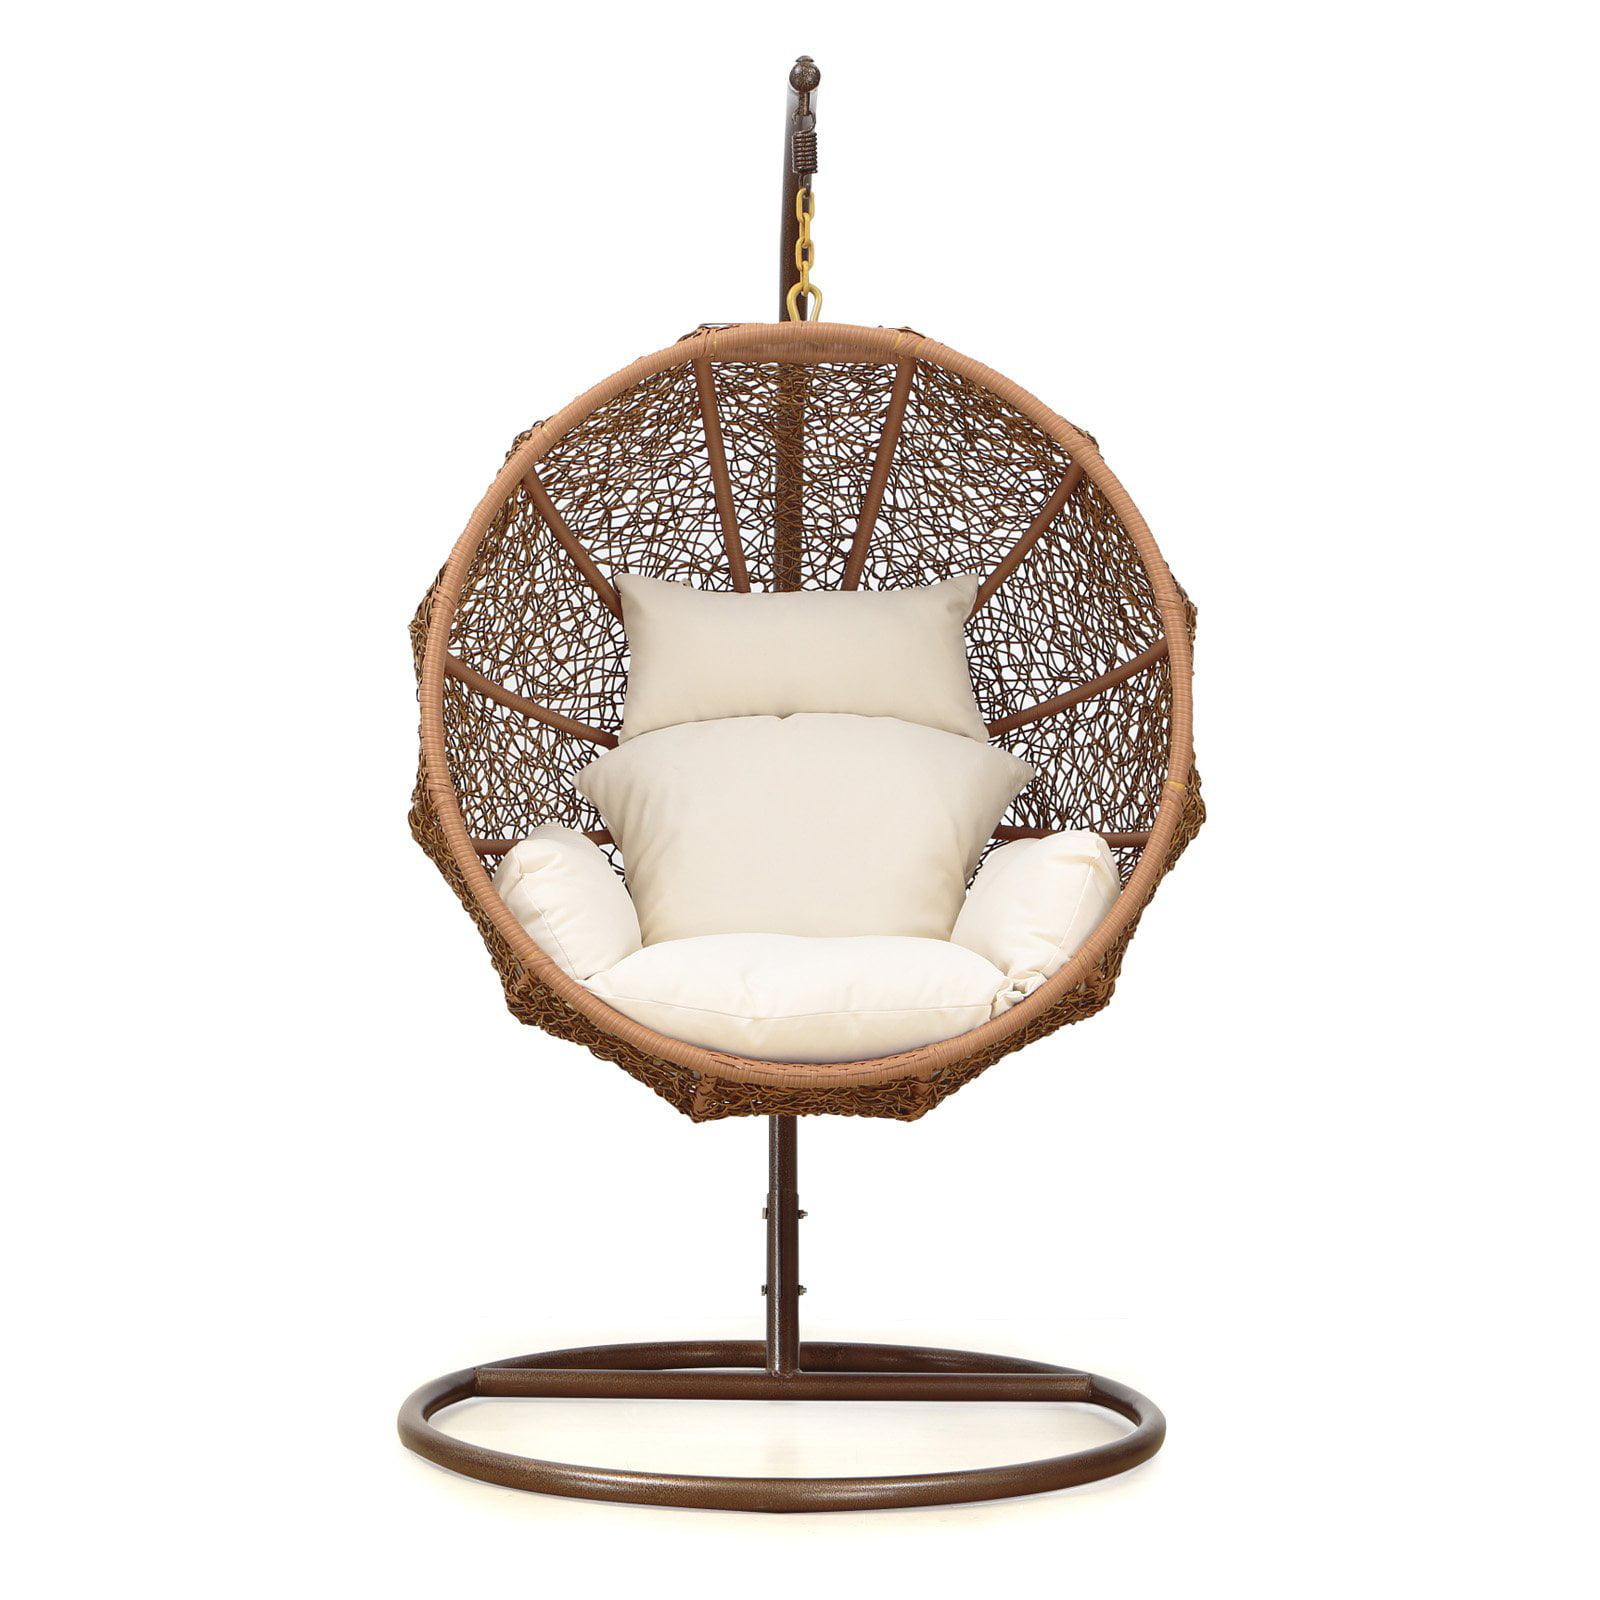 Ceets Zolo Hanging Wicker Lounge Chair